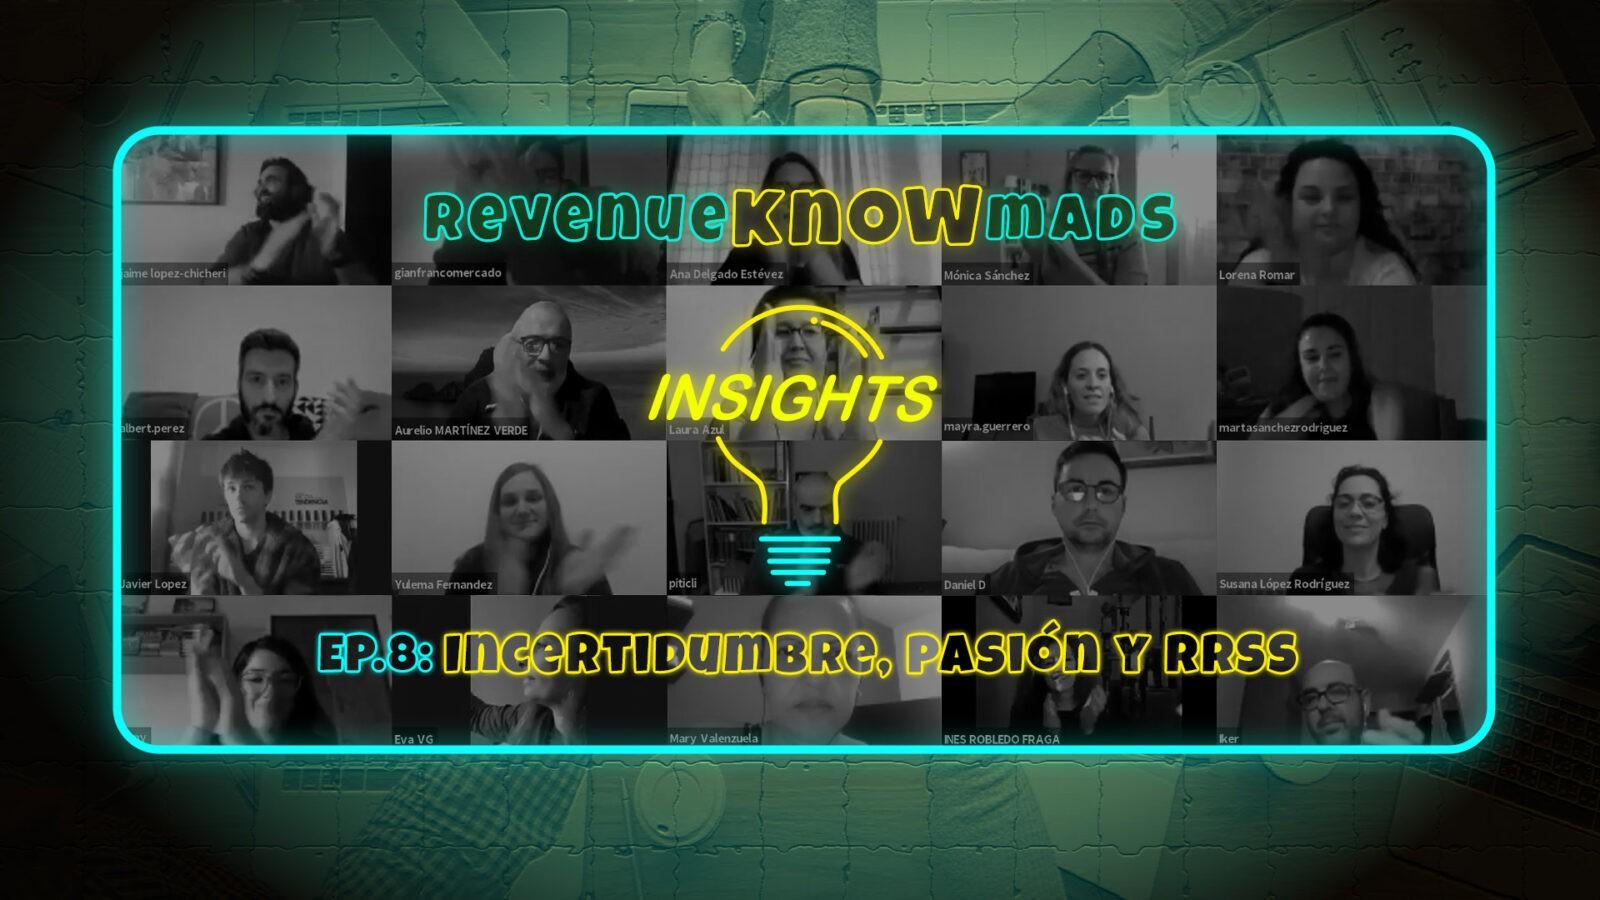 RevenueKnowmads Insights - Ep.8